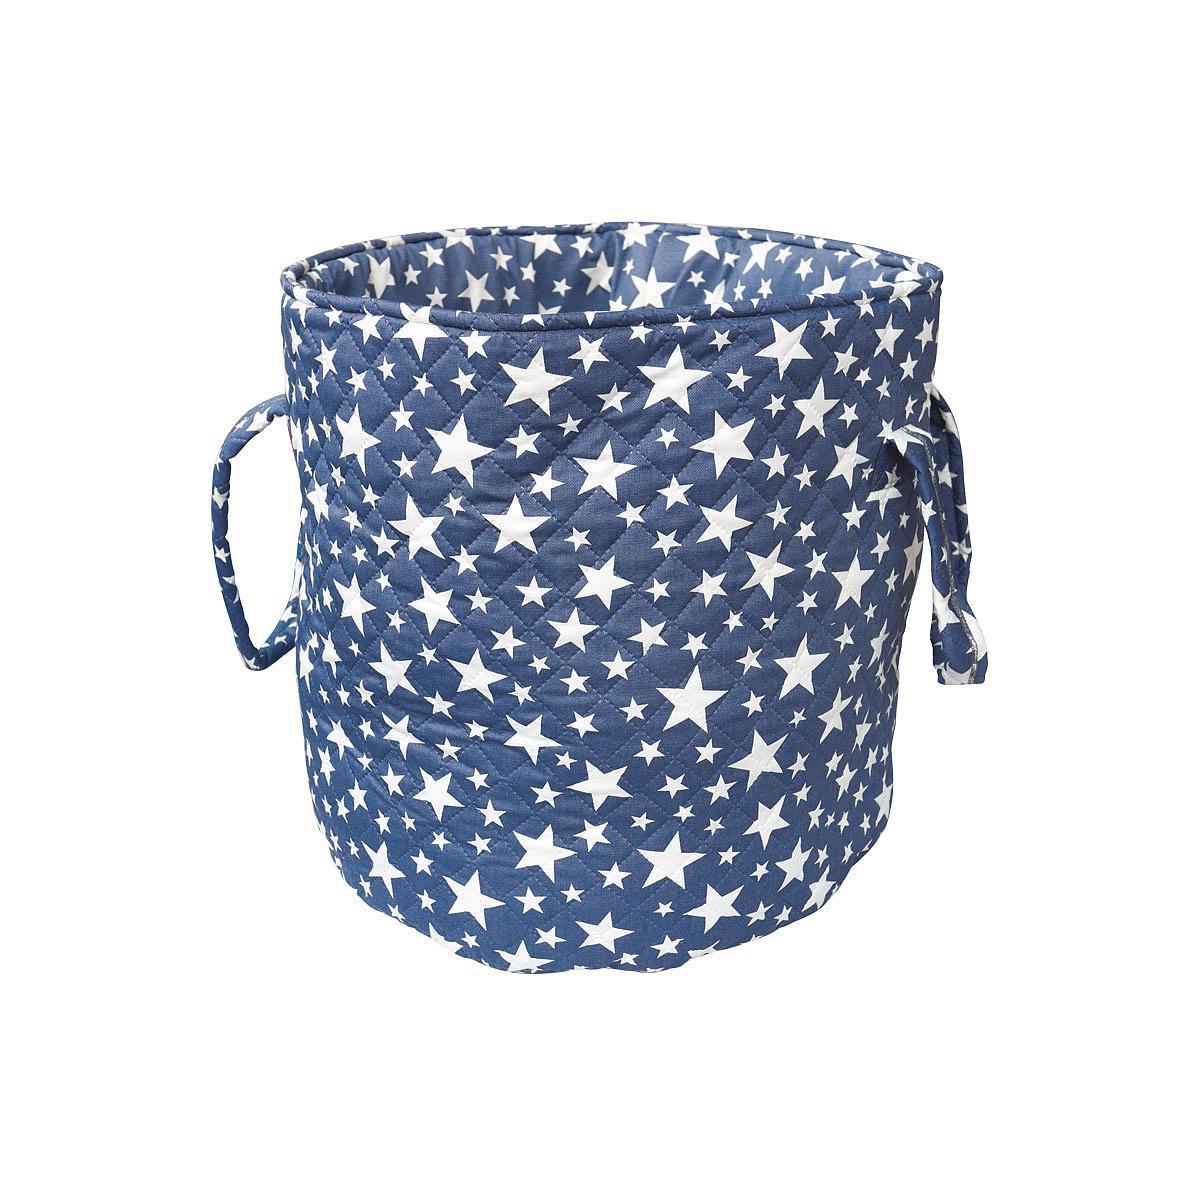 Abitare Kids Jeans Saco Juguetes Blue Guarda Estrellas jqSzVpLGUM